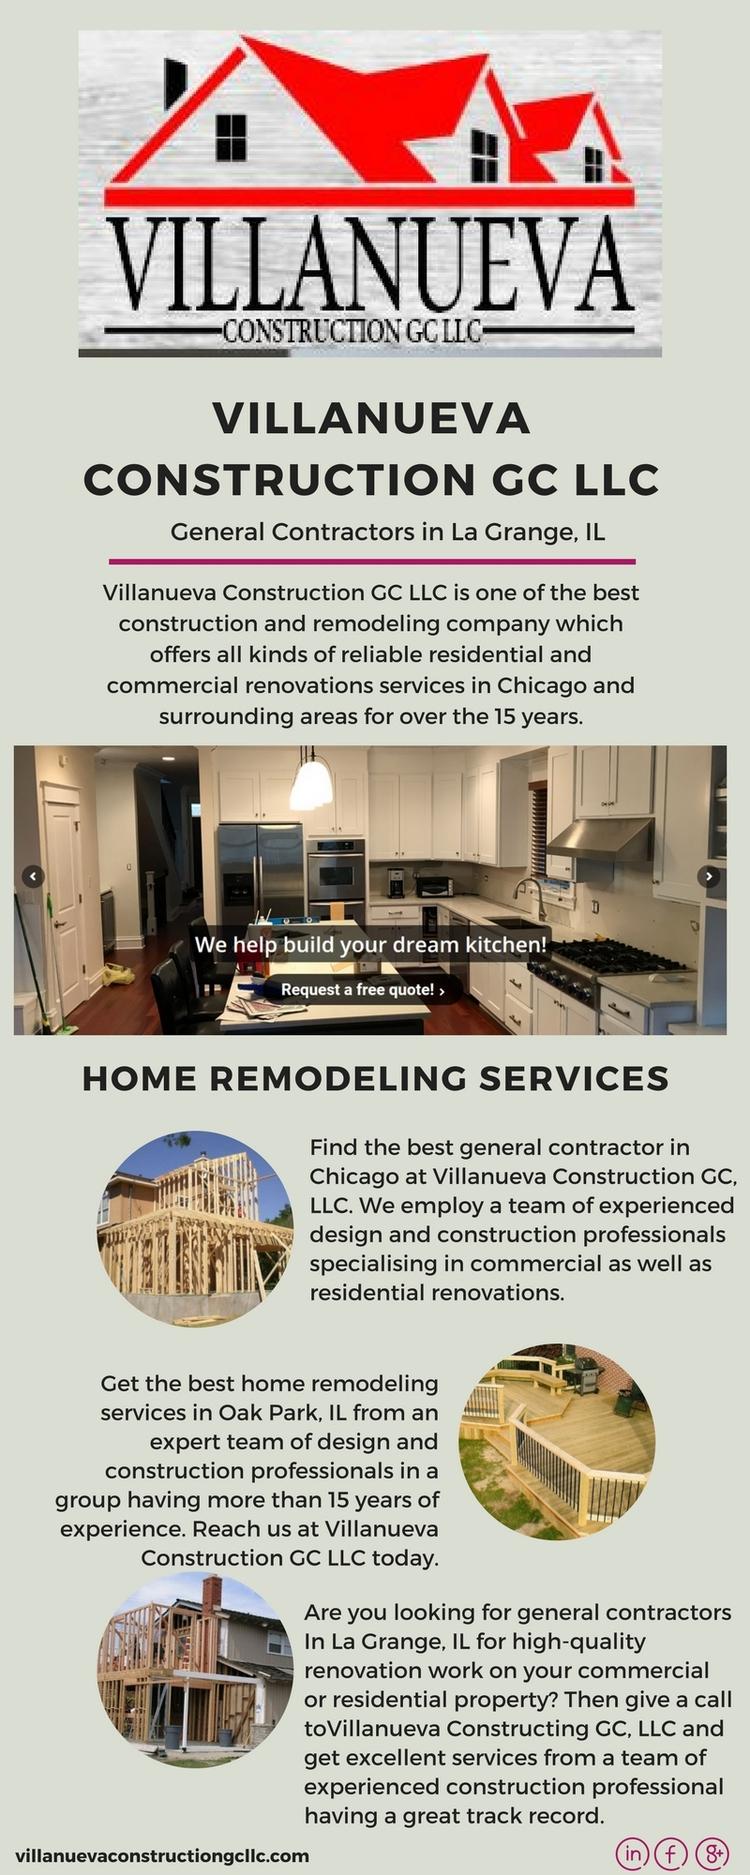 Searching General Contractors B - villanuevaconstruction   ello